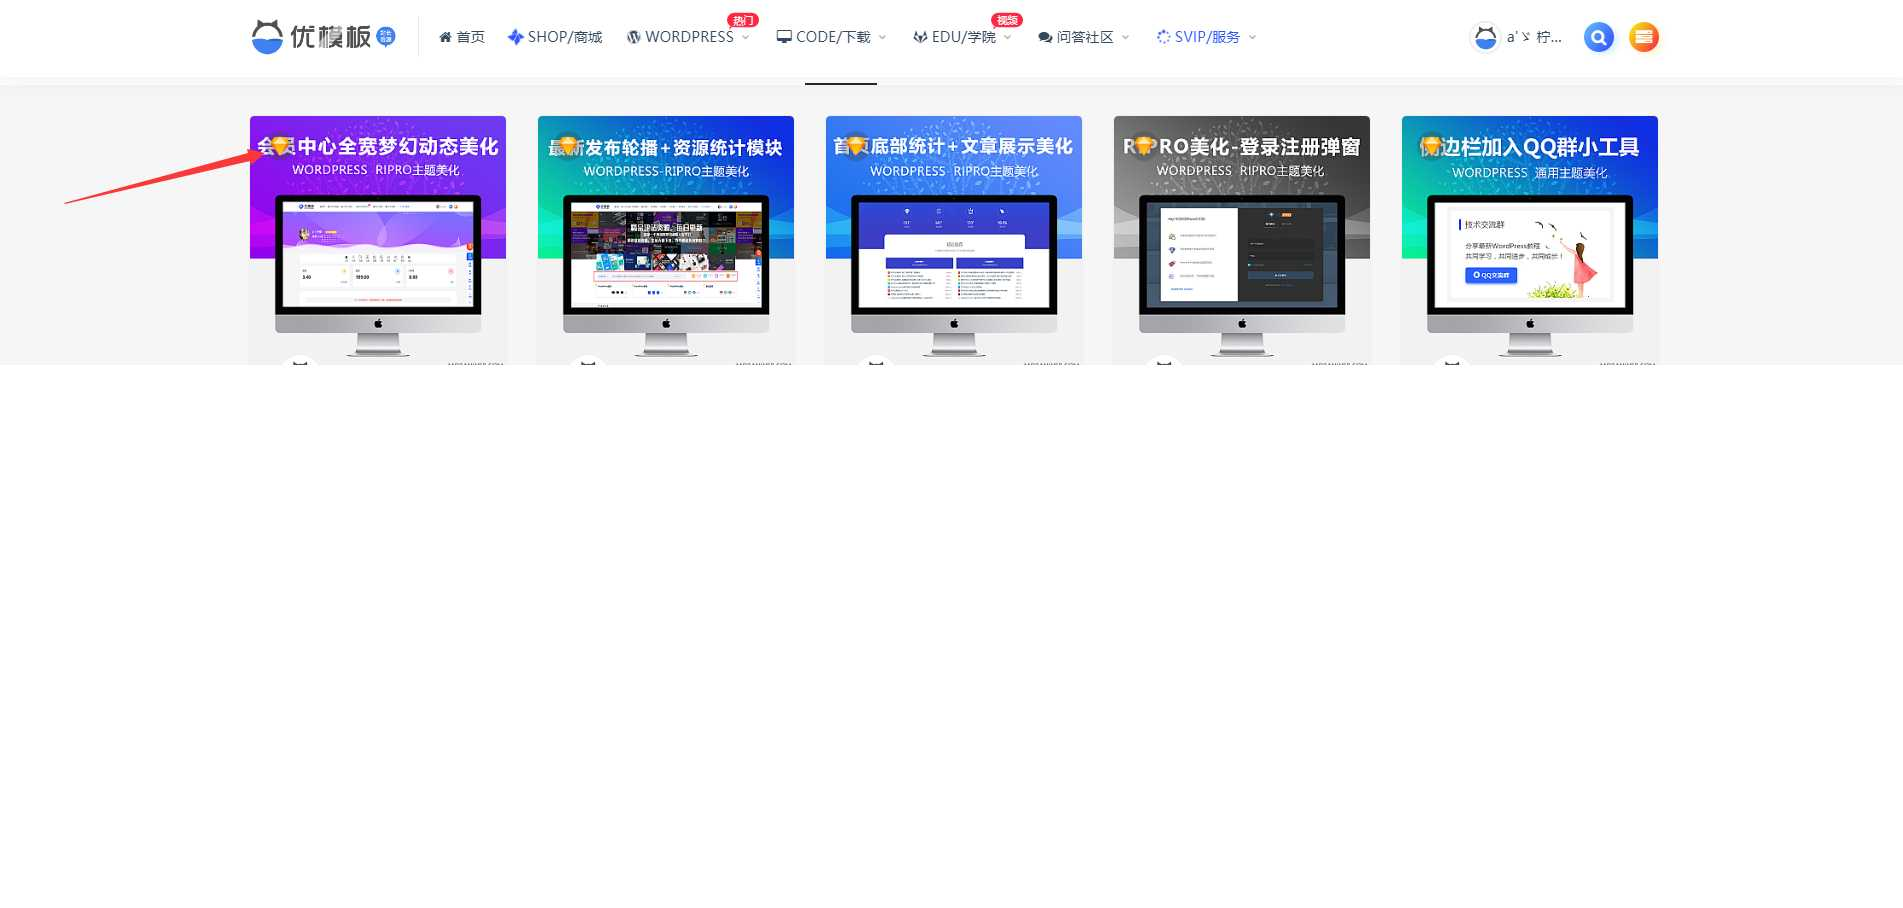 RIPRO主题美化-VIP资源类型角标+免费资源判断图标 WordPress主题美化插图